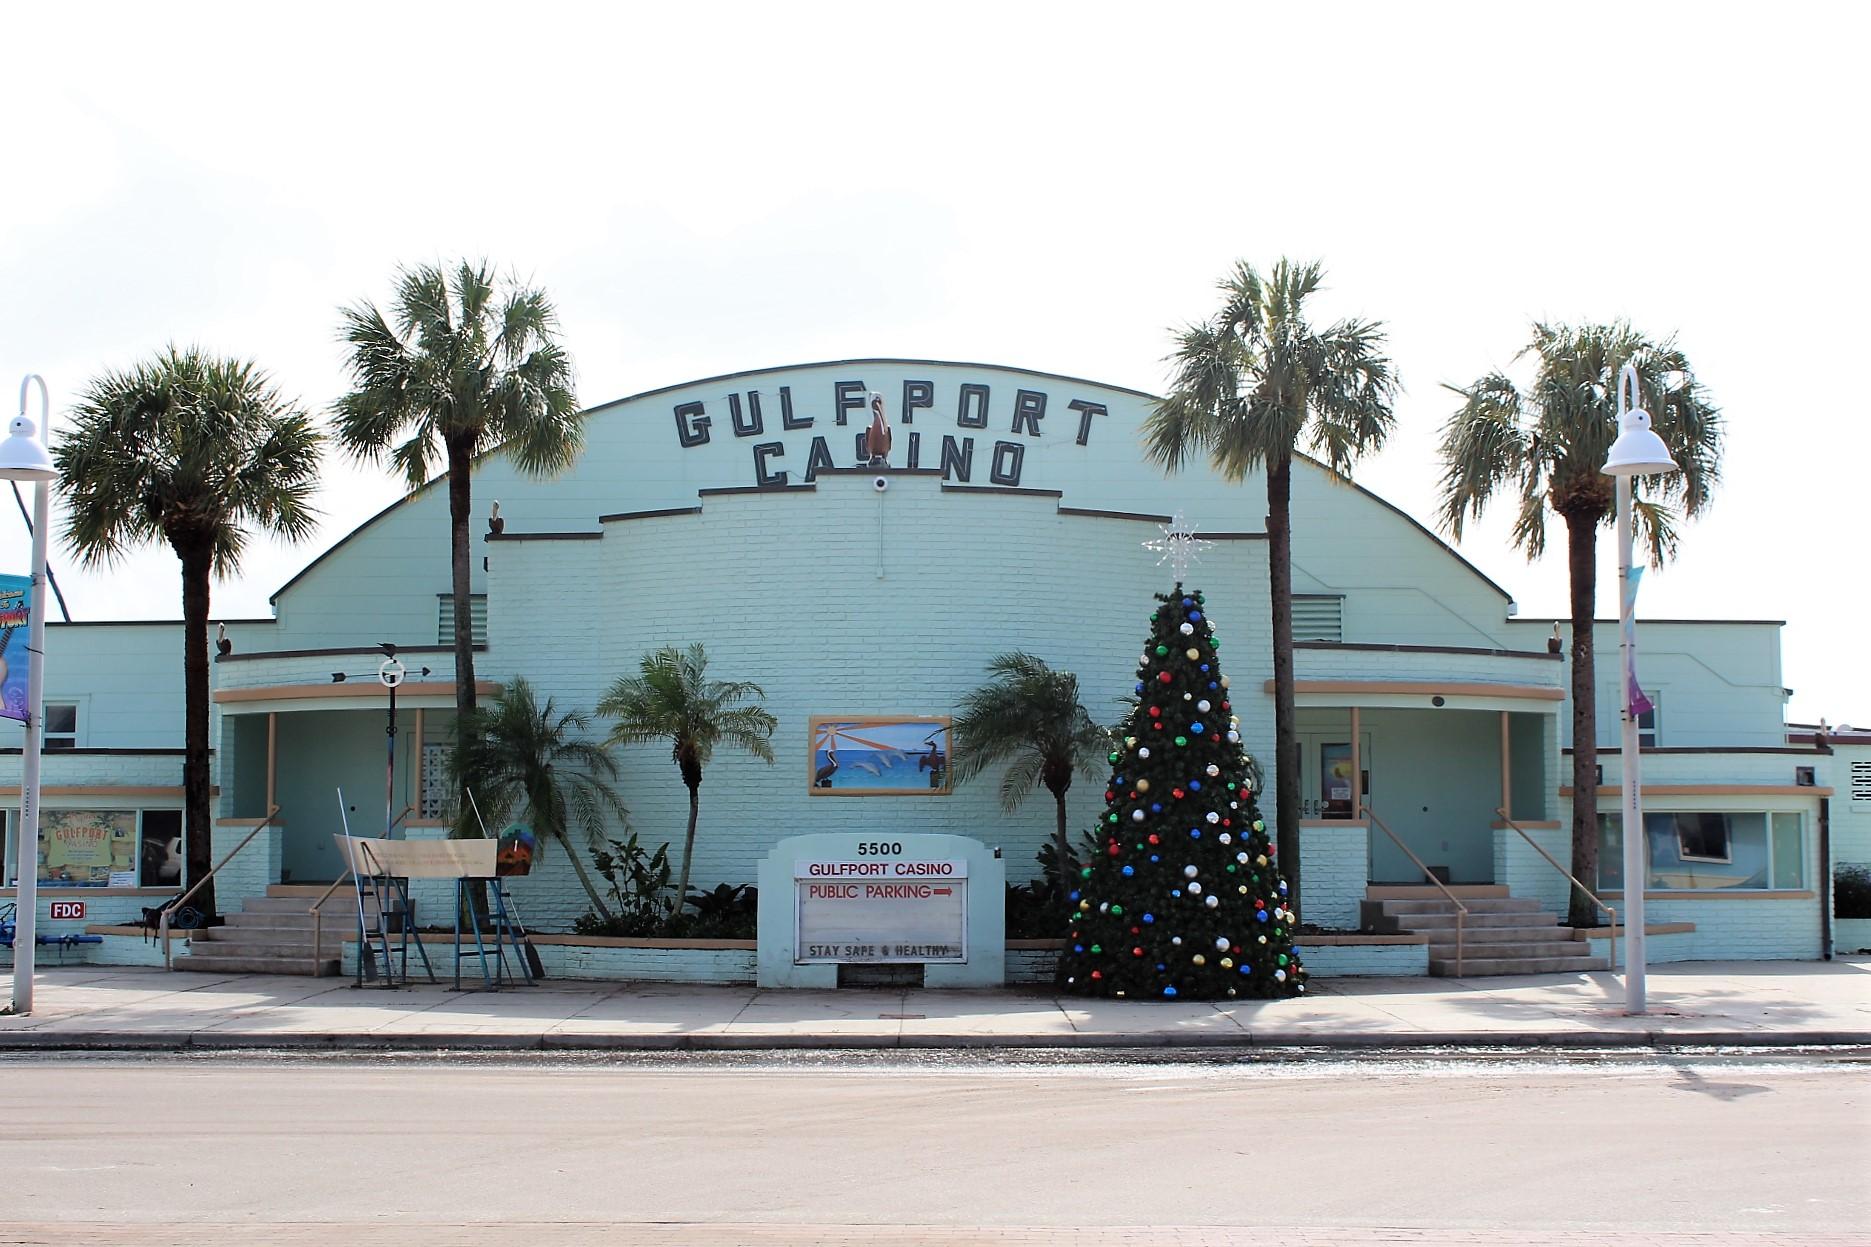 The Gulfport Casino with Christmas display